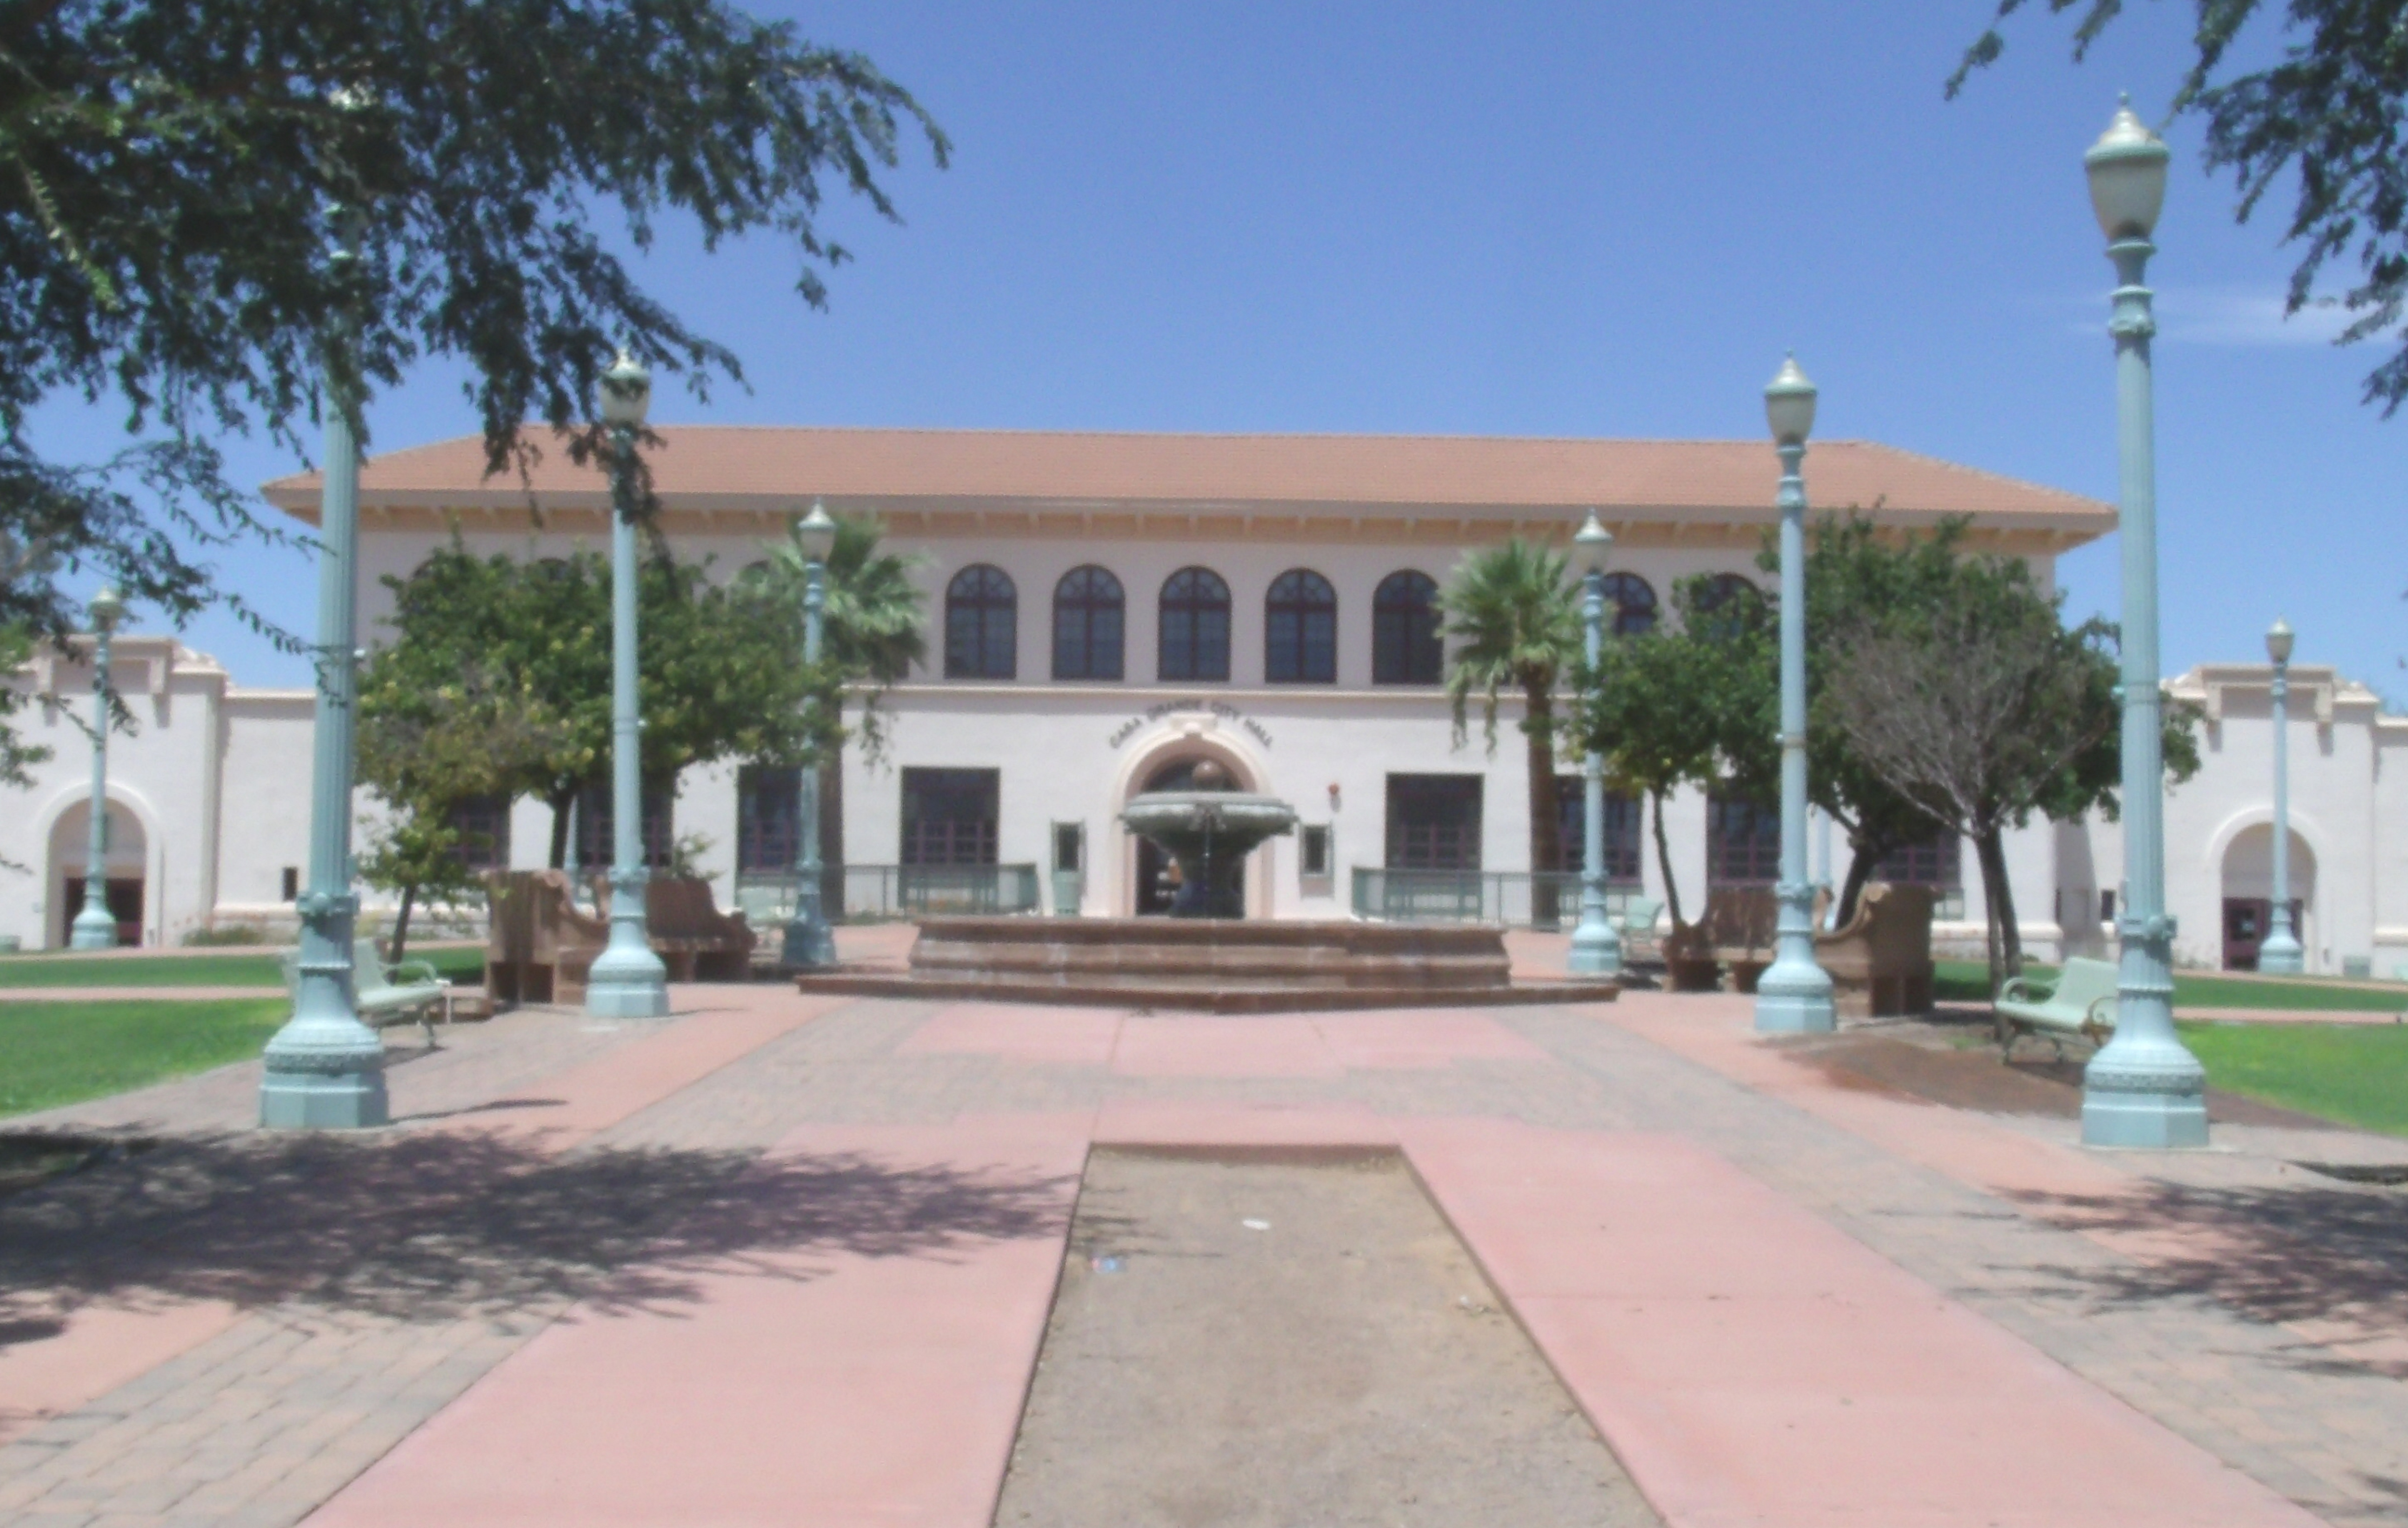 Apartment Manager Salary In Casa Grande Arizona